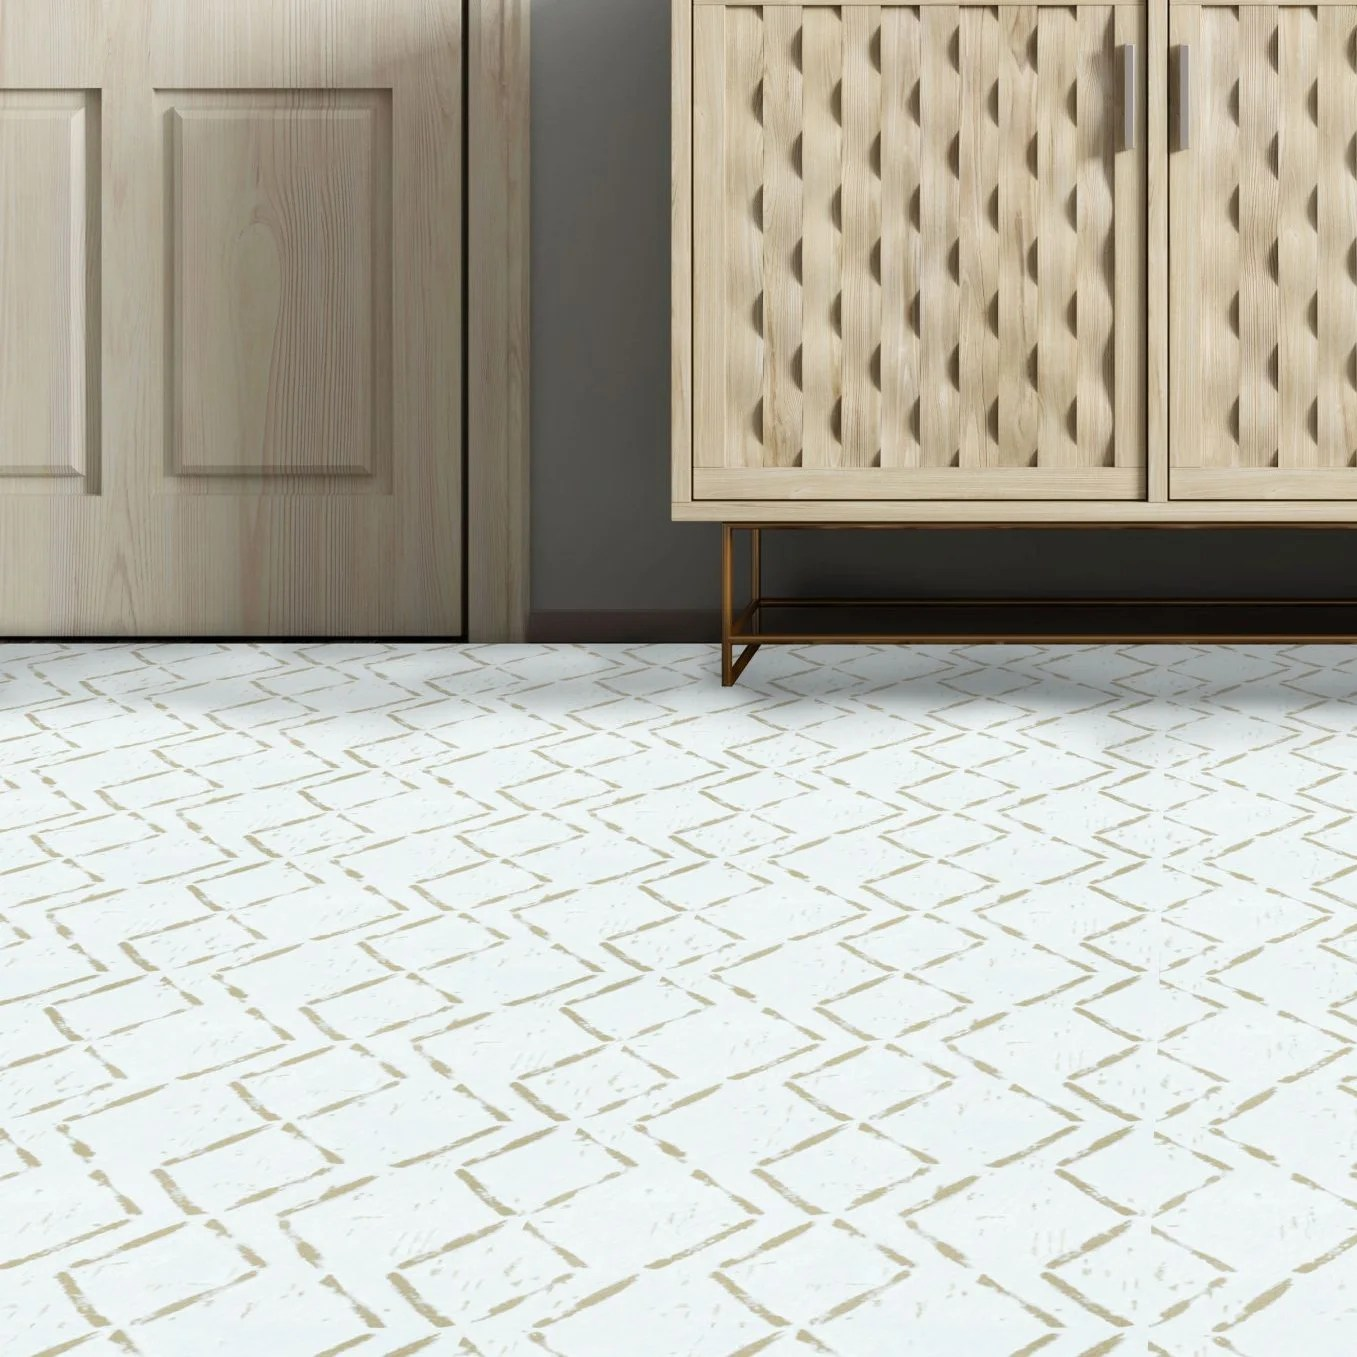 achim importing co retro 12x12 self adhesive vinyl floor tile diamond 20 tiles 20 sq ft wayfair ca